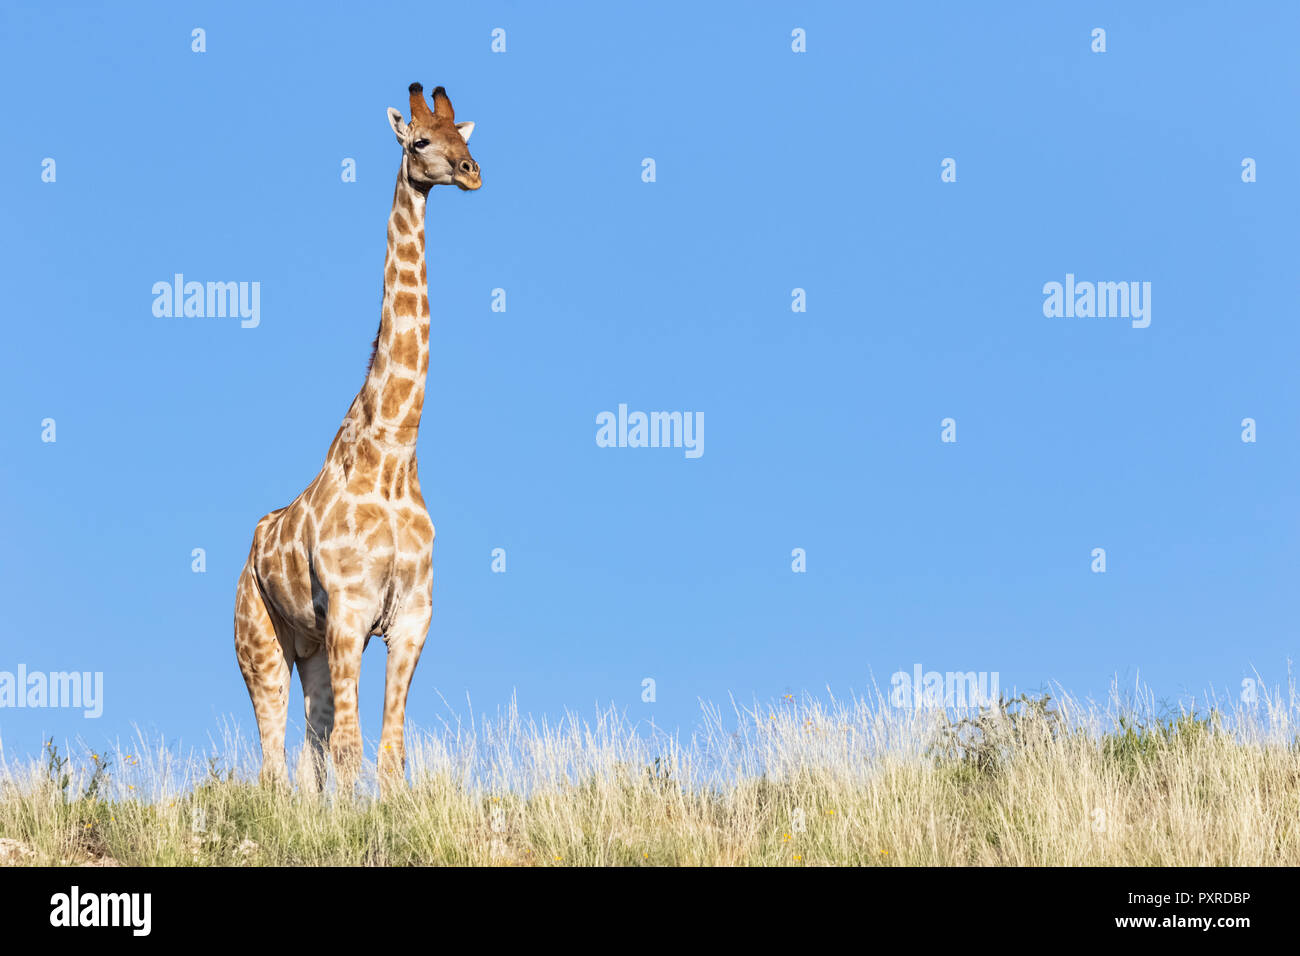 Africa, Botswana, Kgalagadi Transfrontier Park, Giraffe - Stock Image